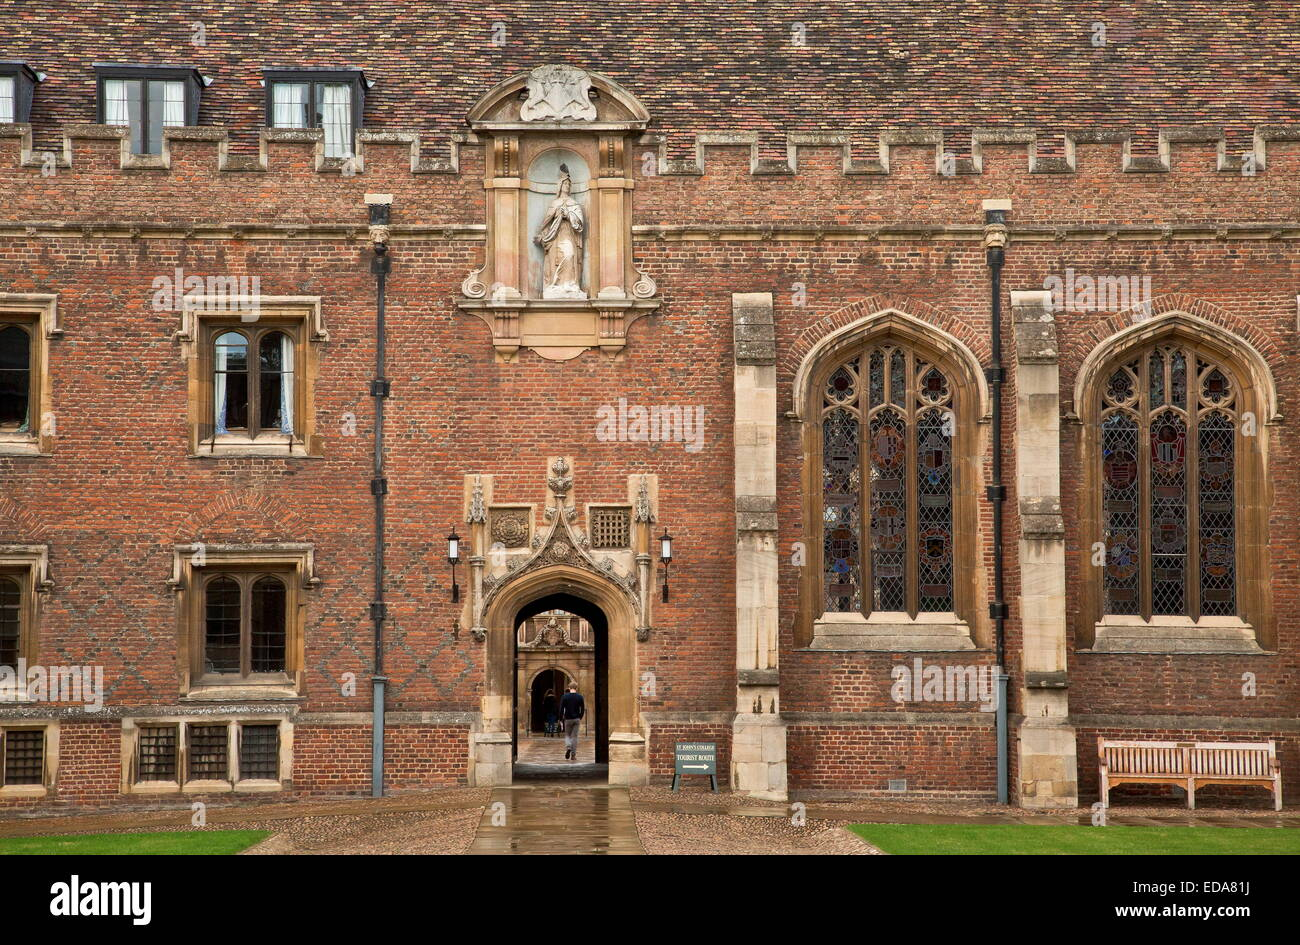 In St John's College, Cambridge, UK. - Stock Image